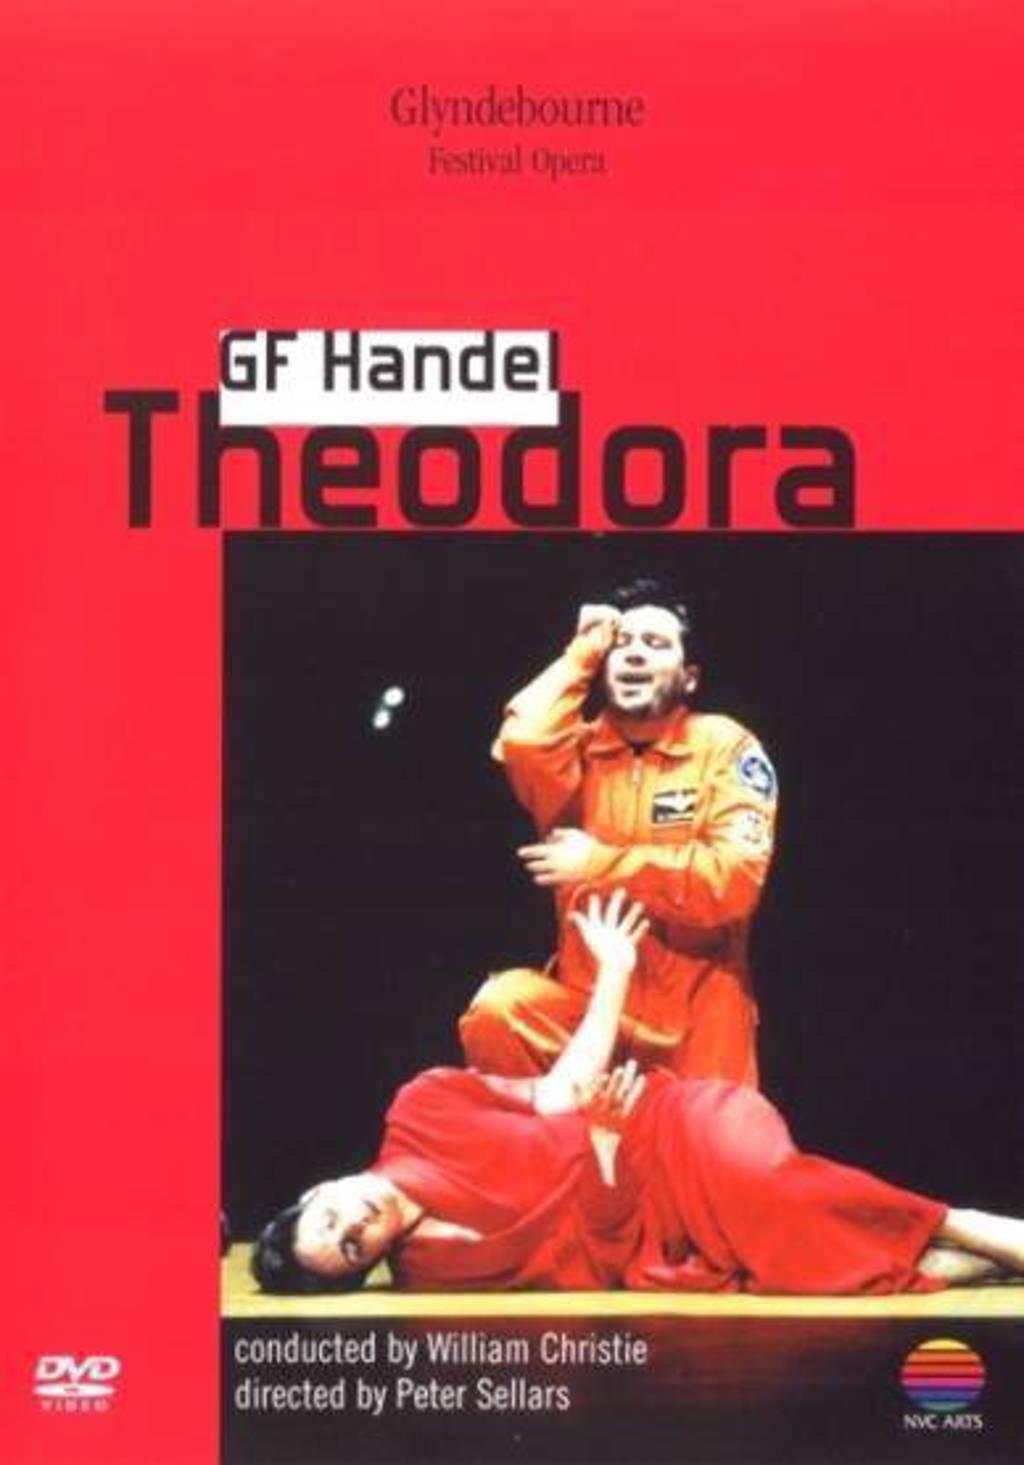 Glyndebourne Festival Opera - Theodora (DVD)